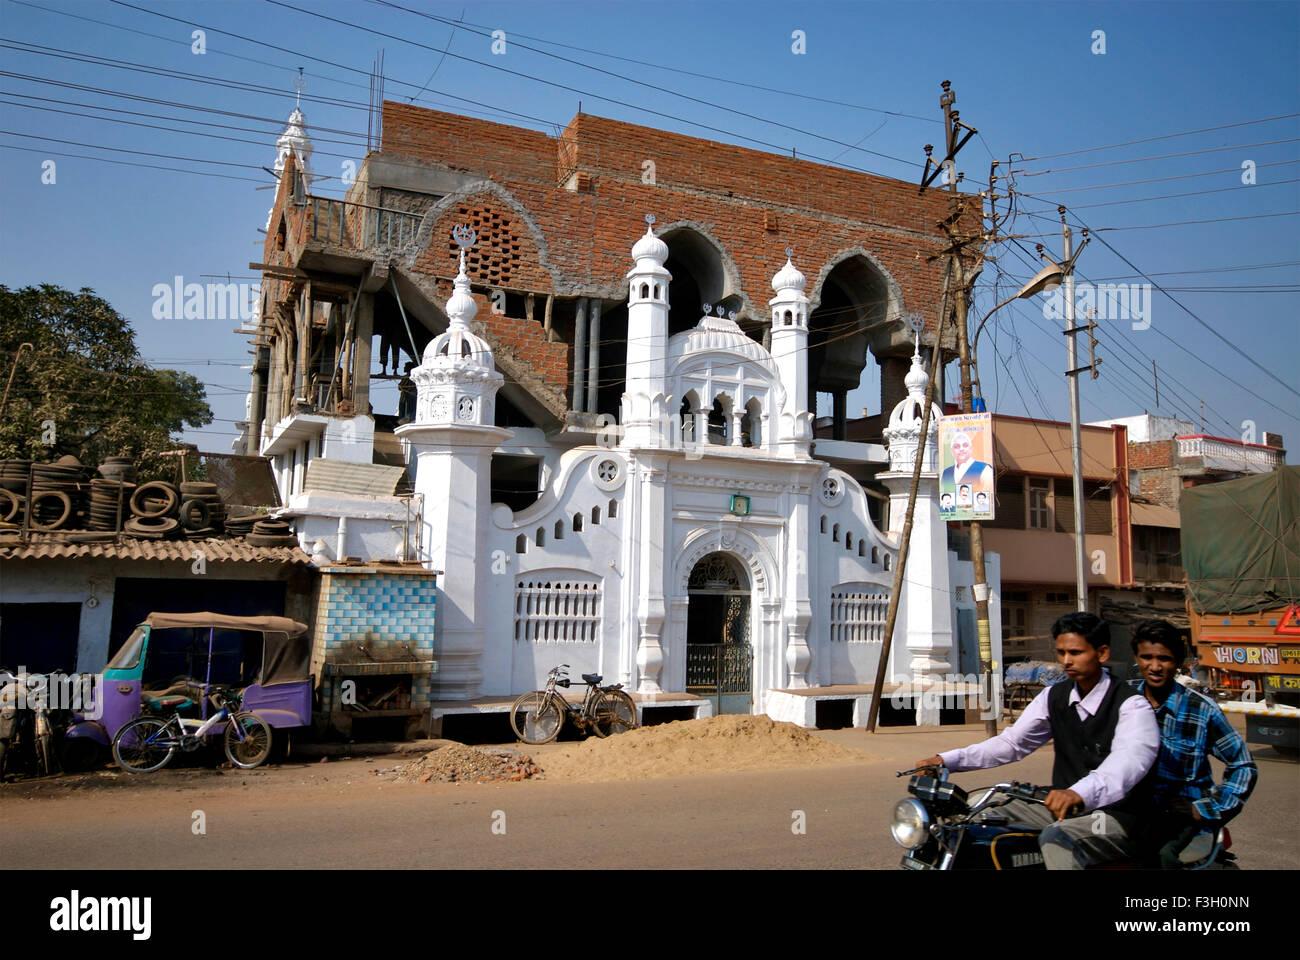 Motorcycle riders ride past at construction site of Mosque ; Katni ; Madhya Pradesh ; India - Stock Image